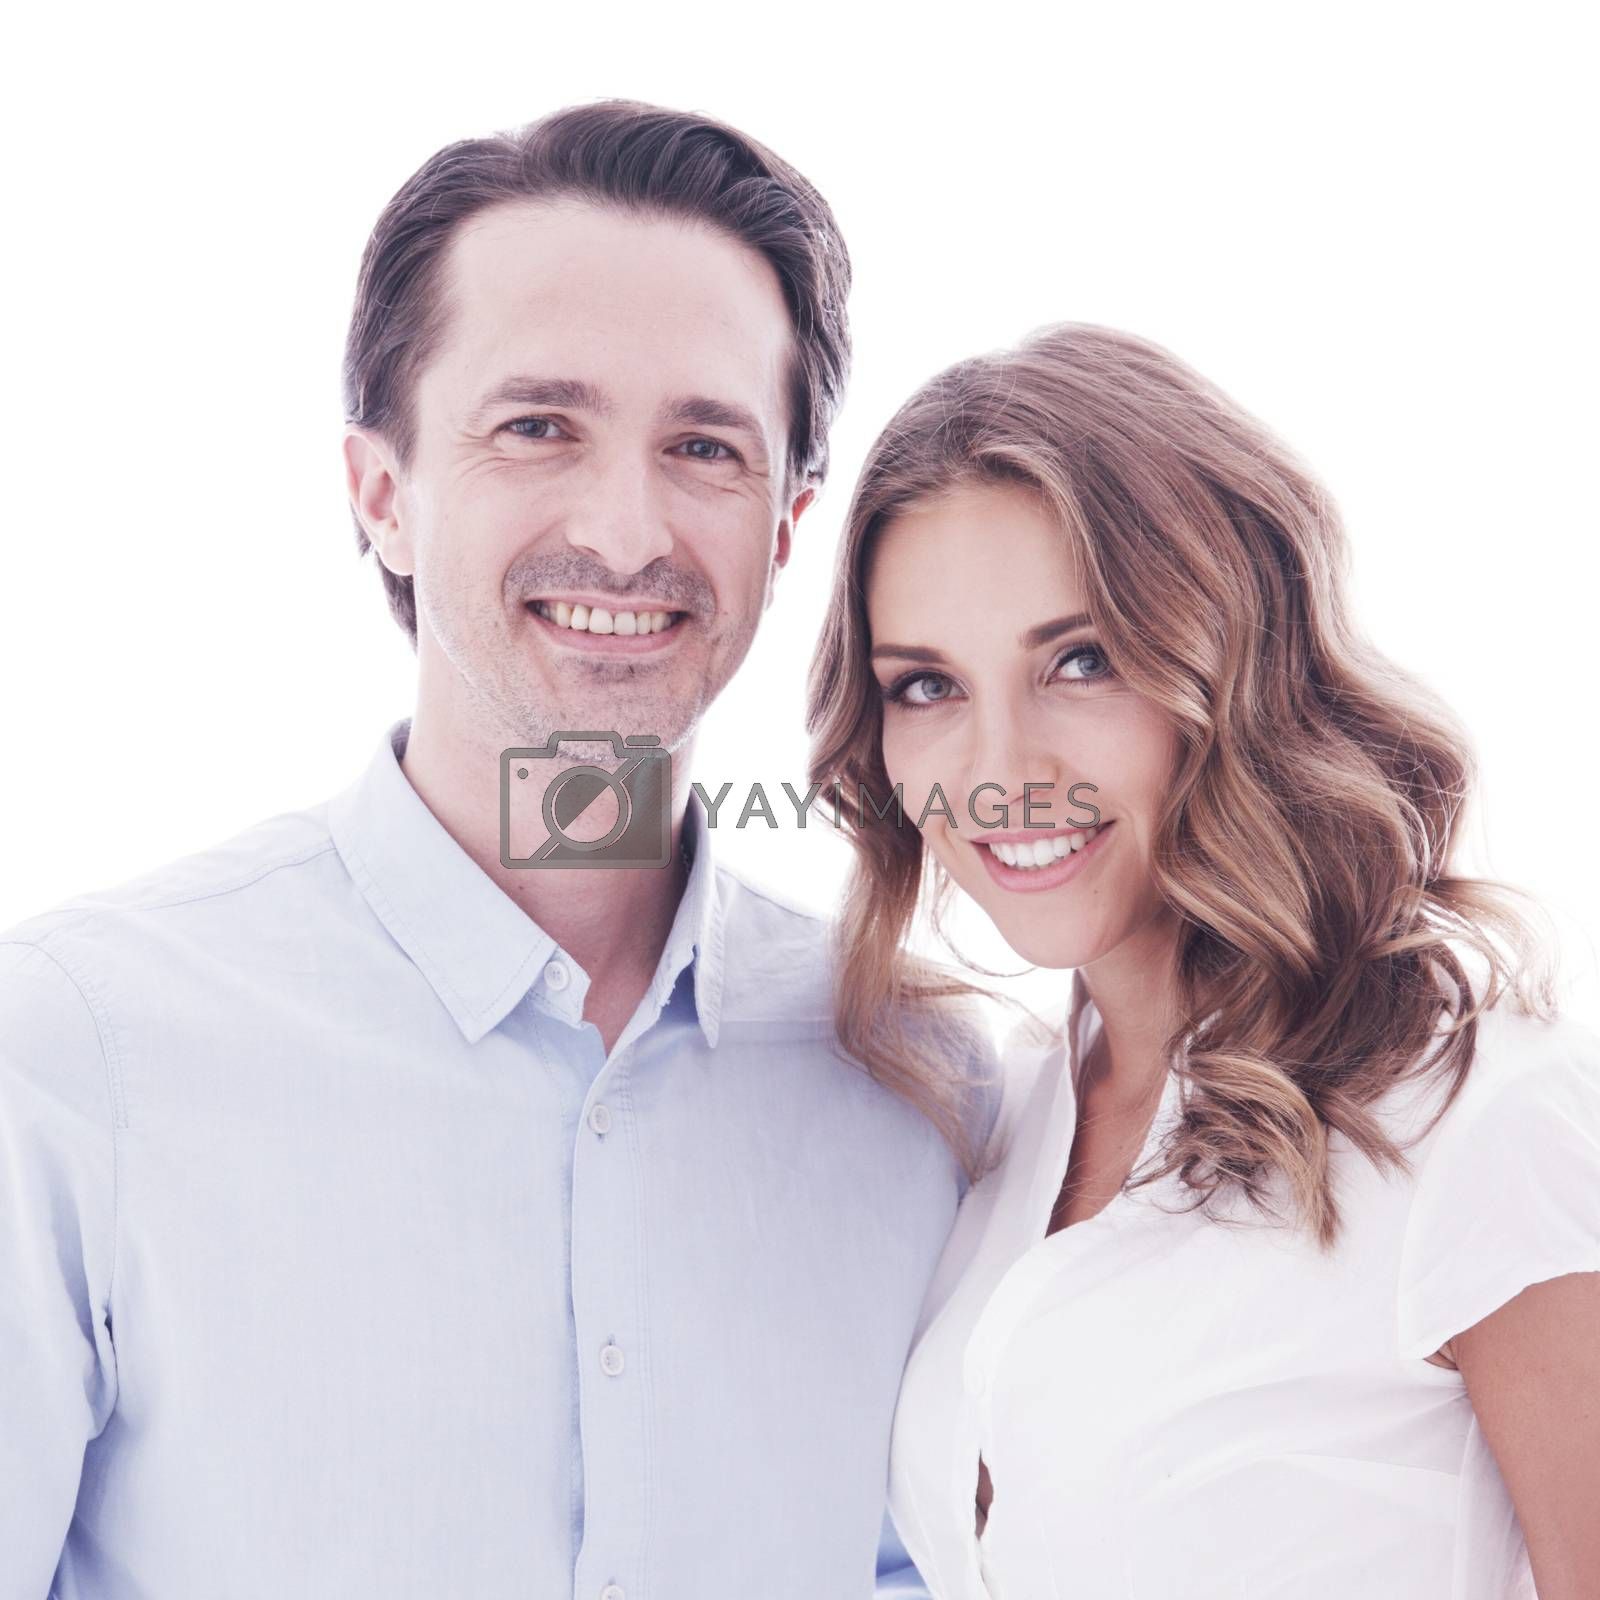 Portrait of happy smiling couple isolated on white background